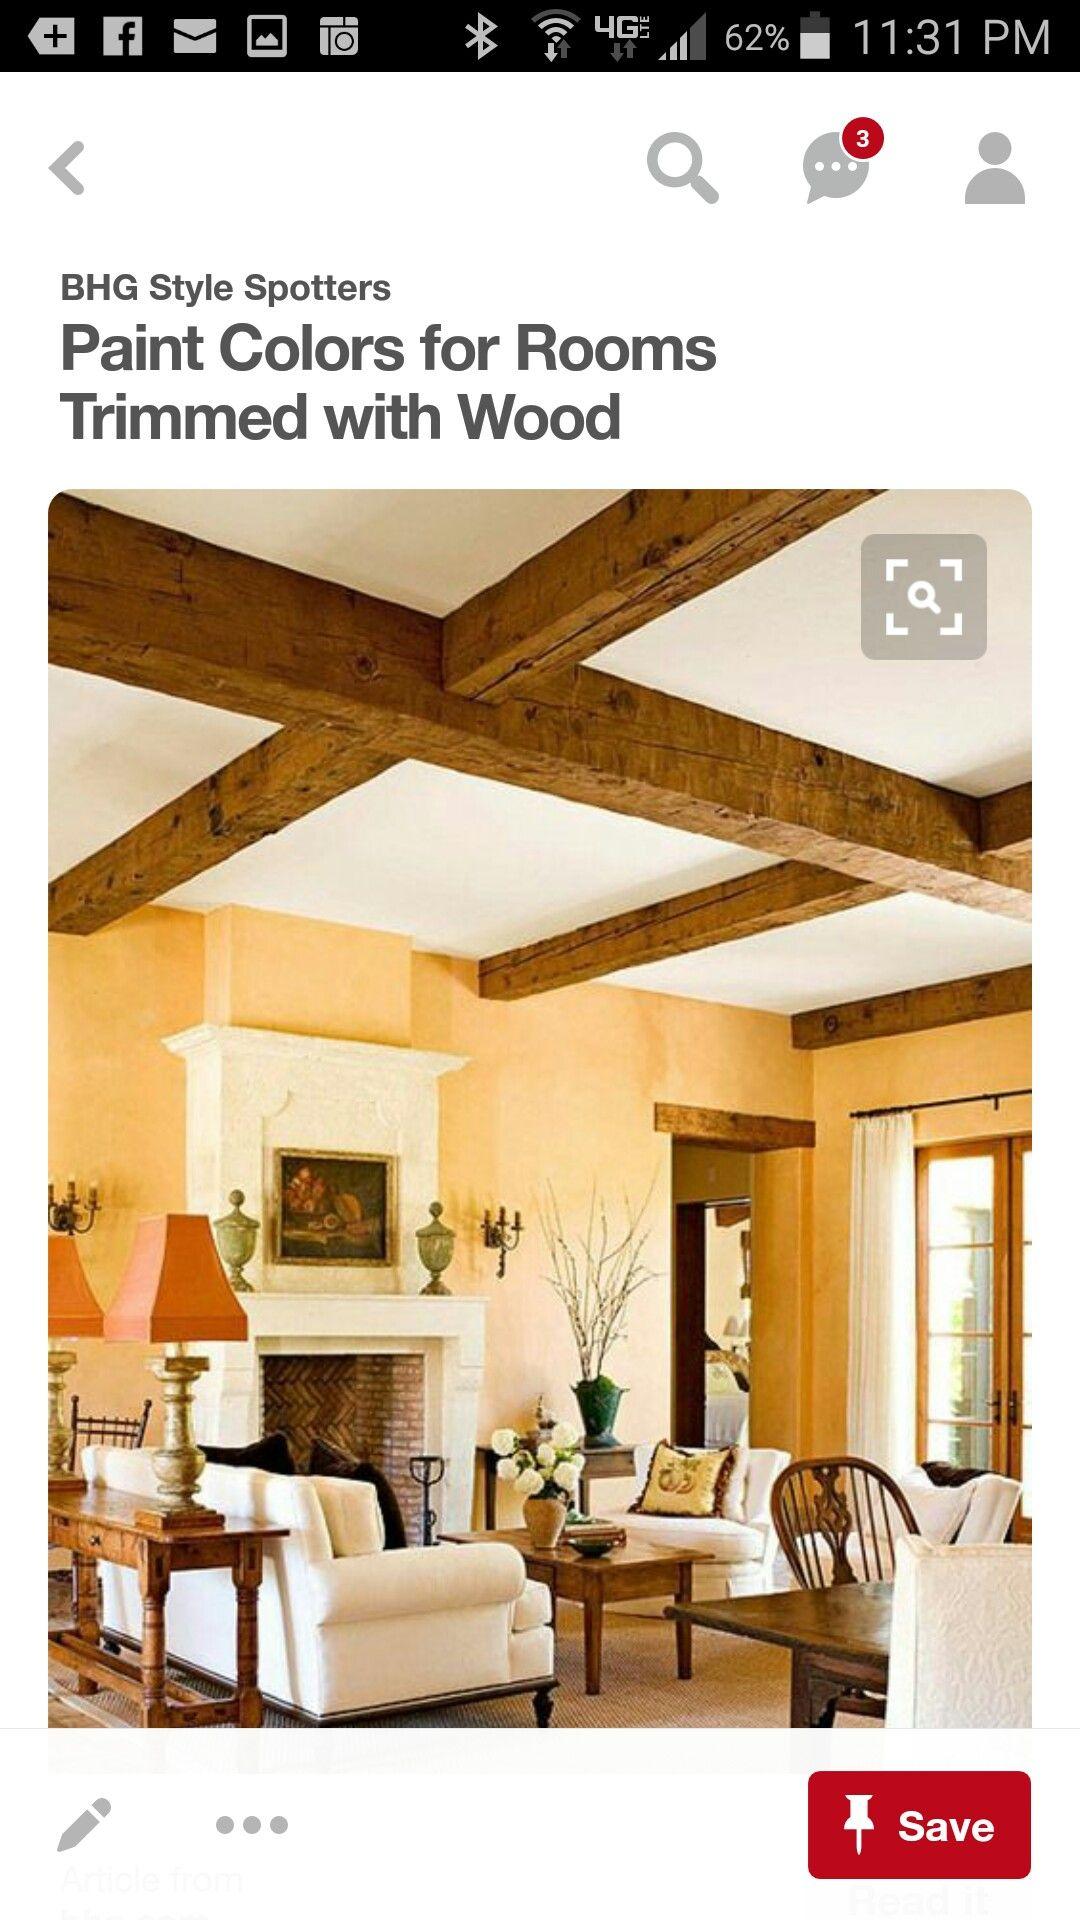 Pin by Jennifer Glenn-Majuta on Wood beam/ceiling ideas | Pinterest ...